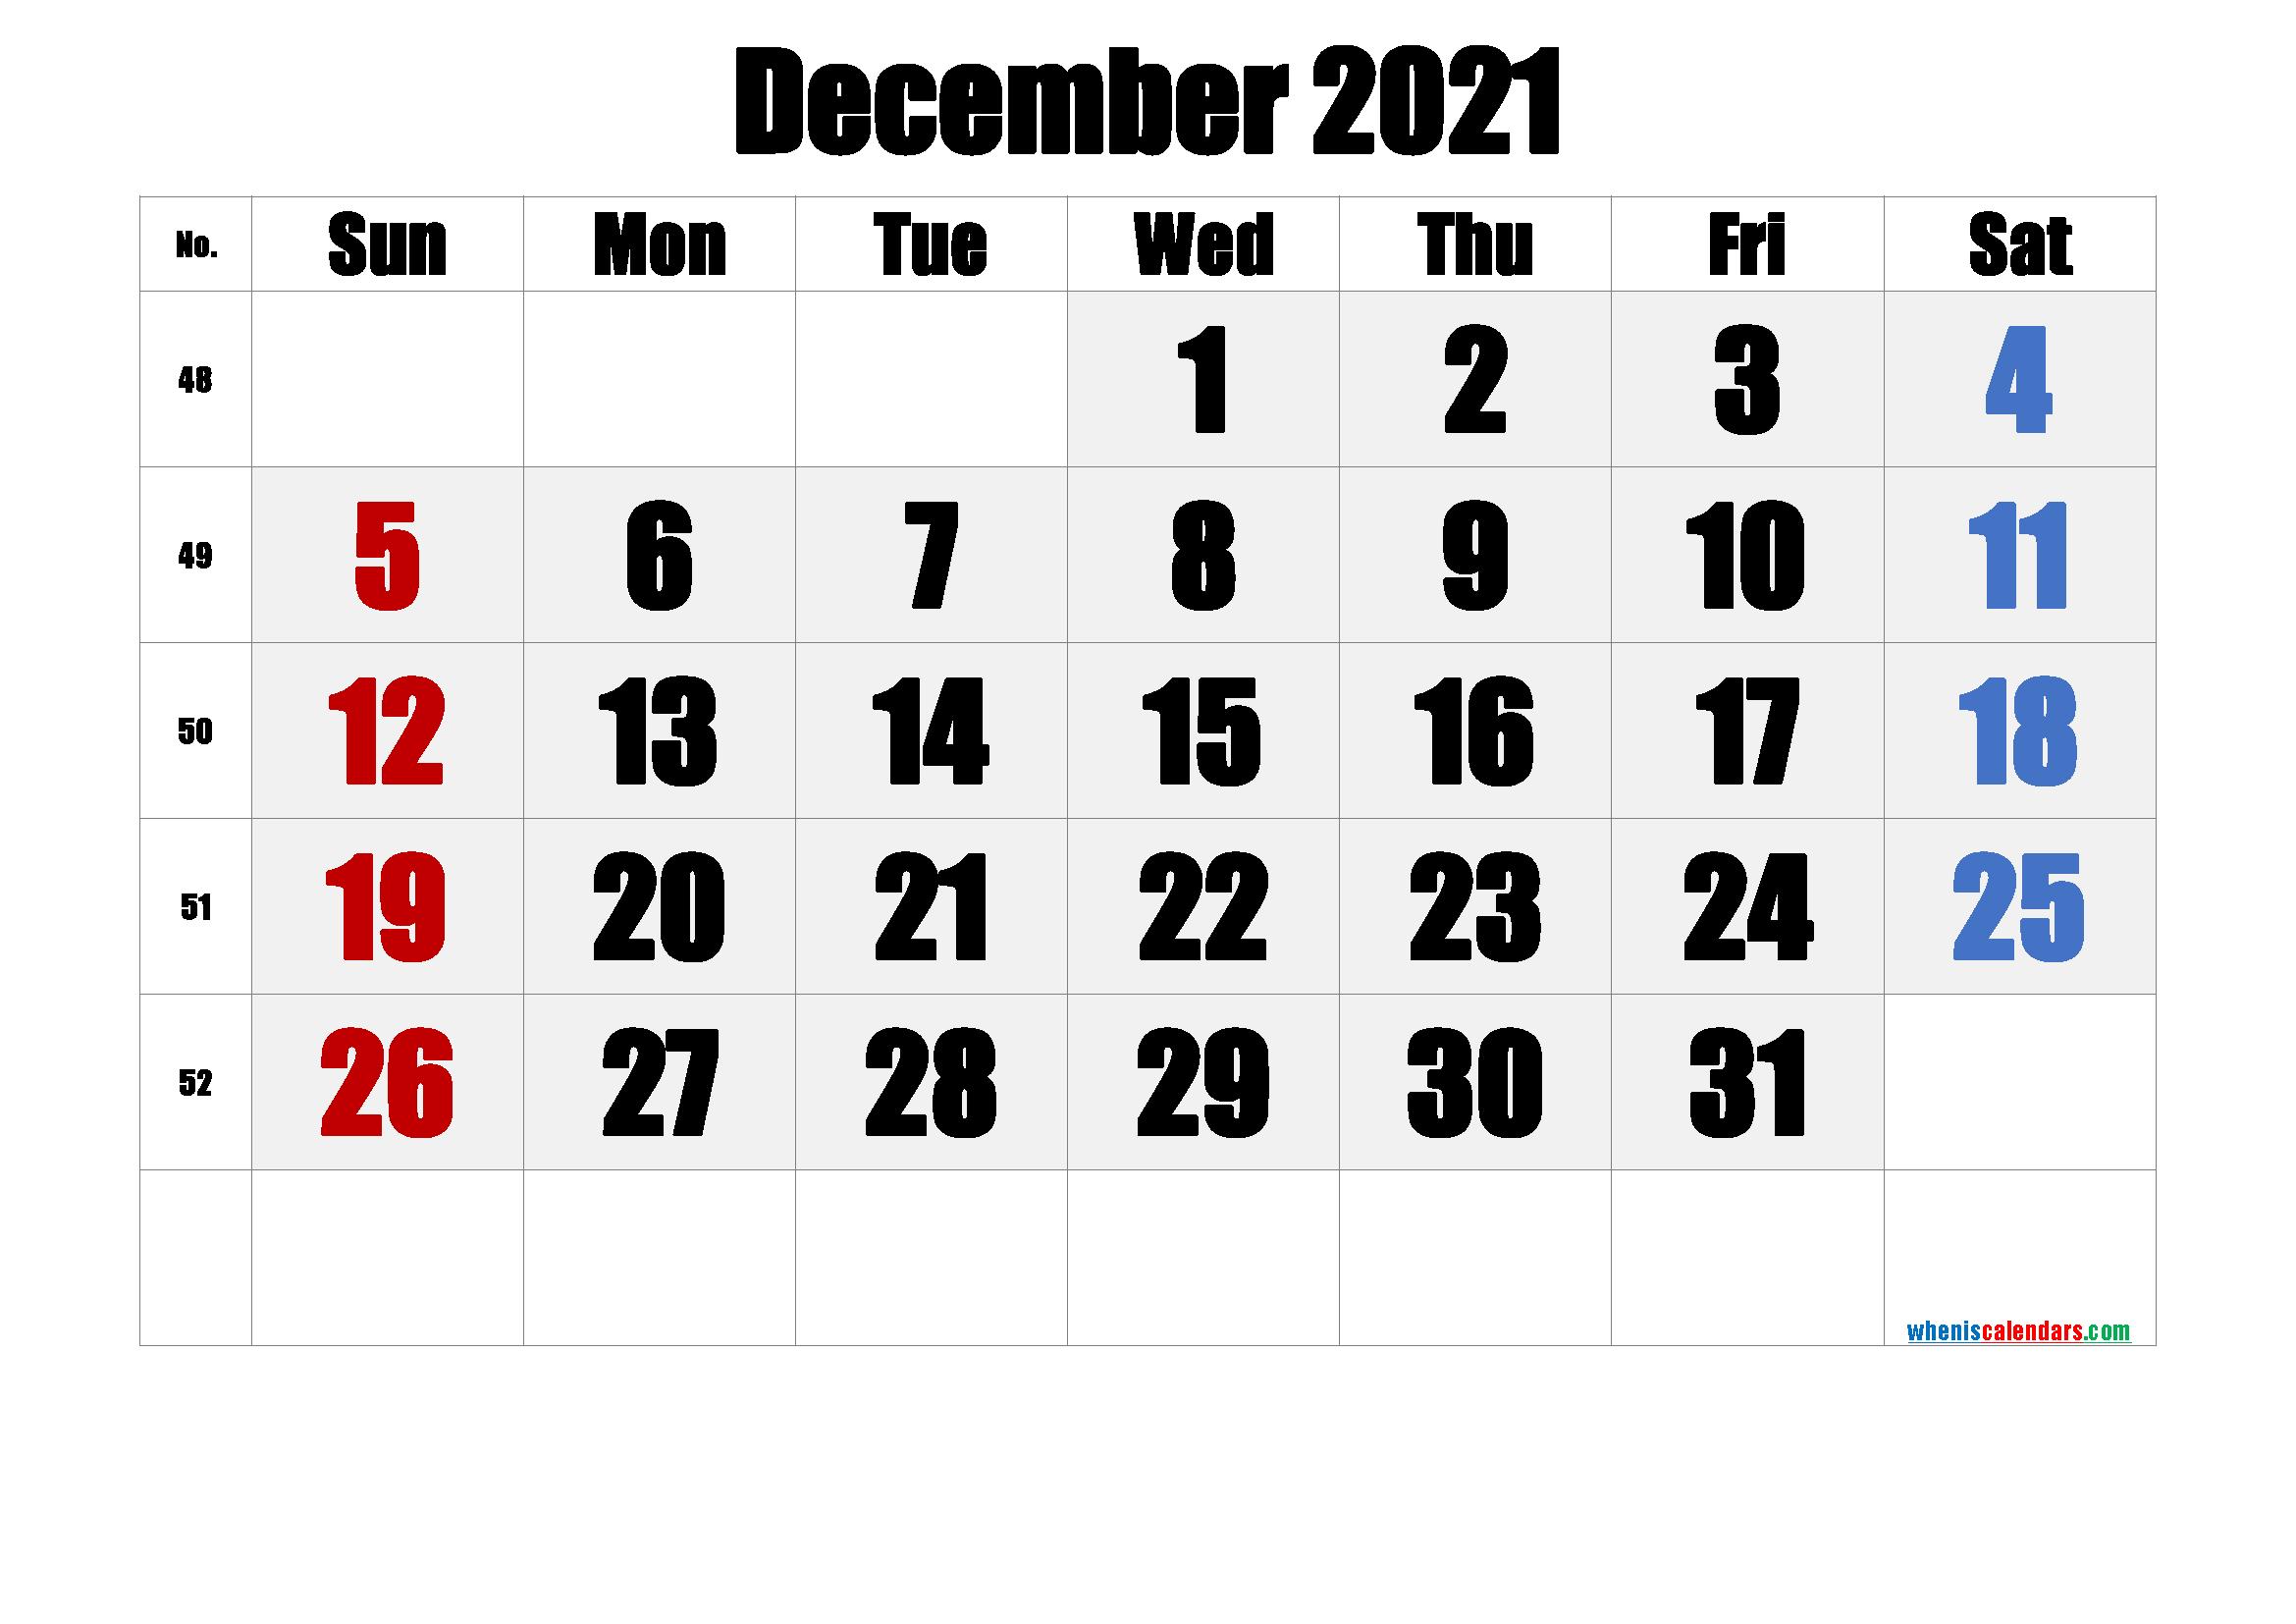 December 2021 Printable Calendar